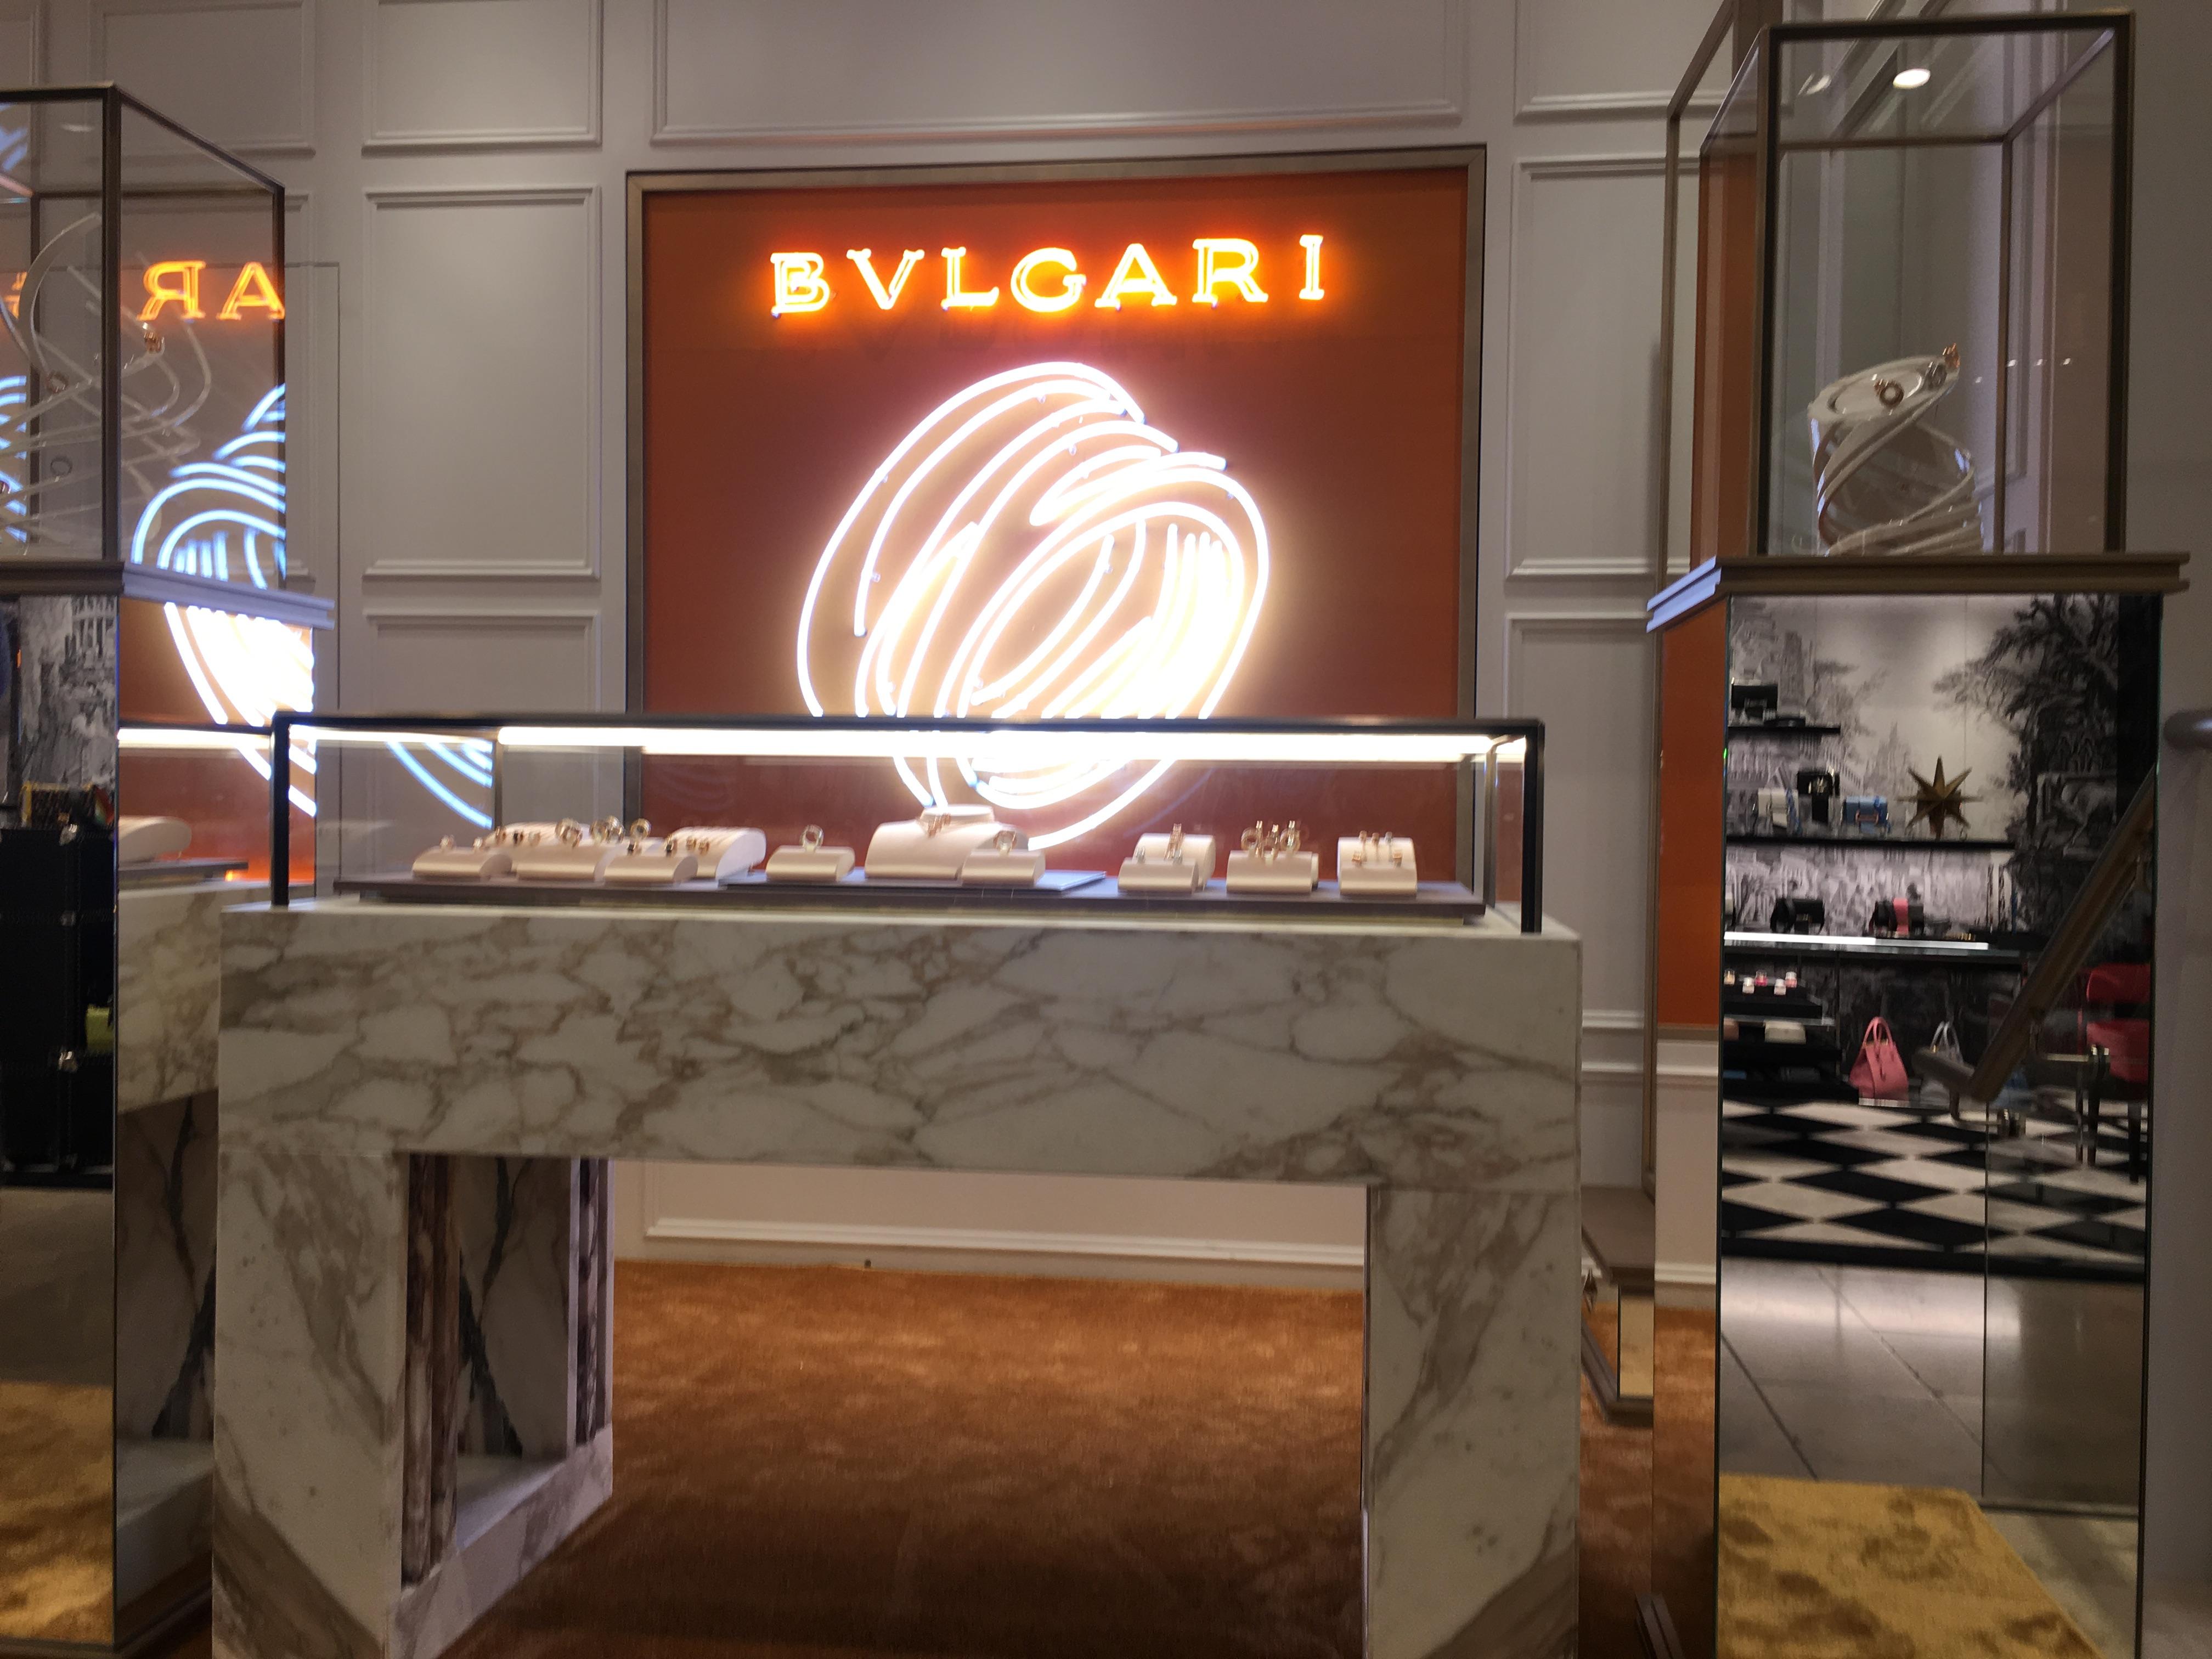 Retail Maintenance: Bulgari